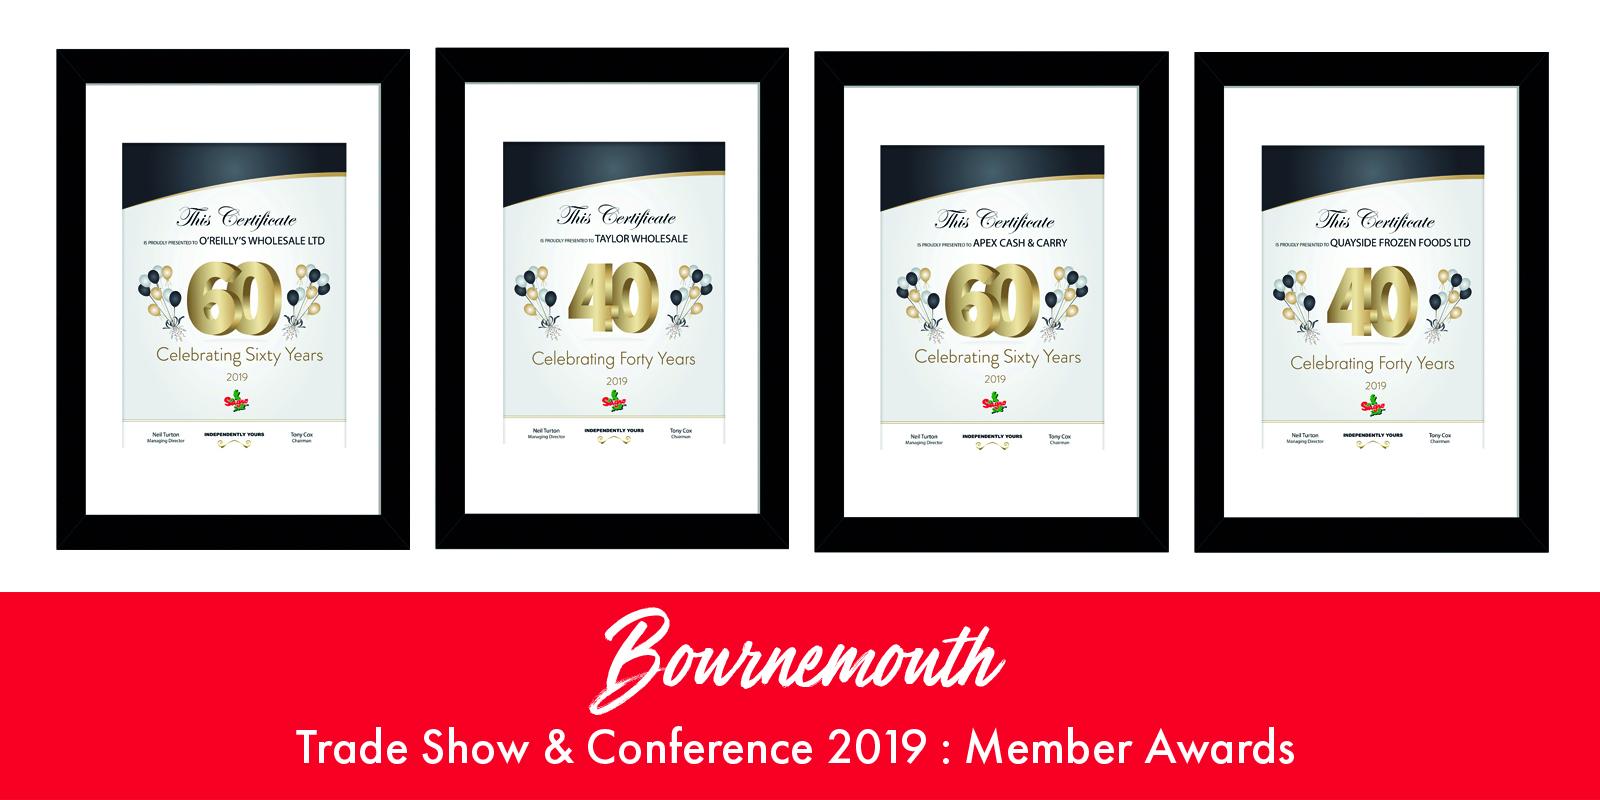 Sugro UK News | Bournemouth Trade Show & Conference 2019: Member Awards